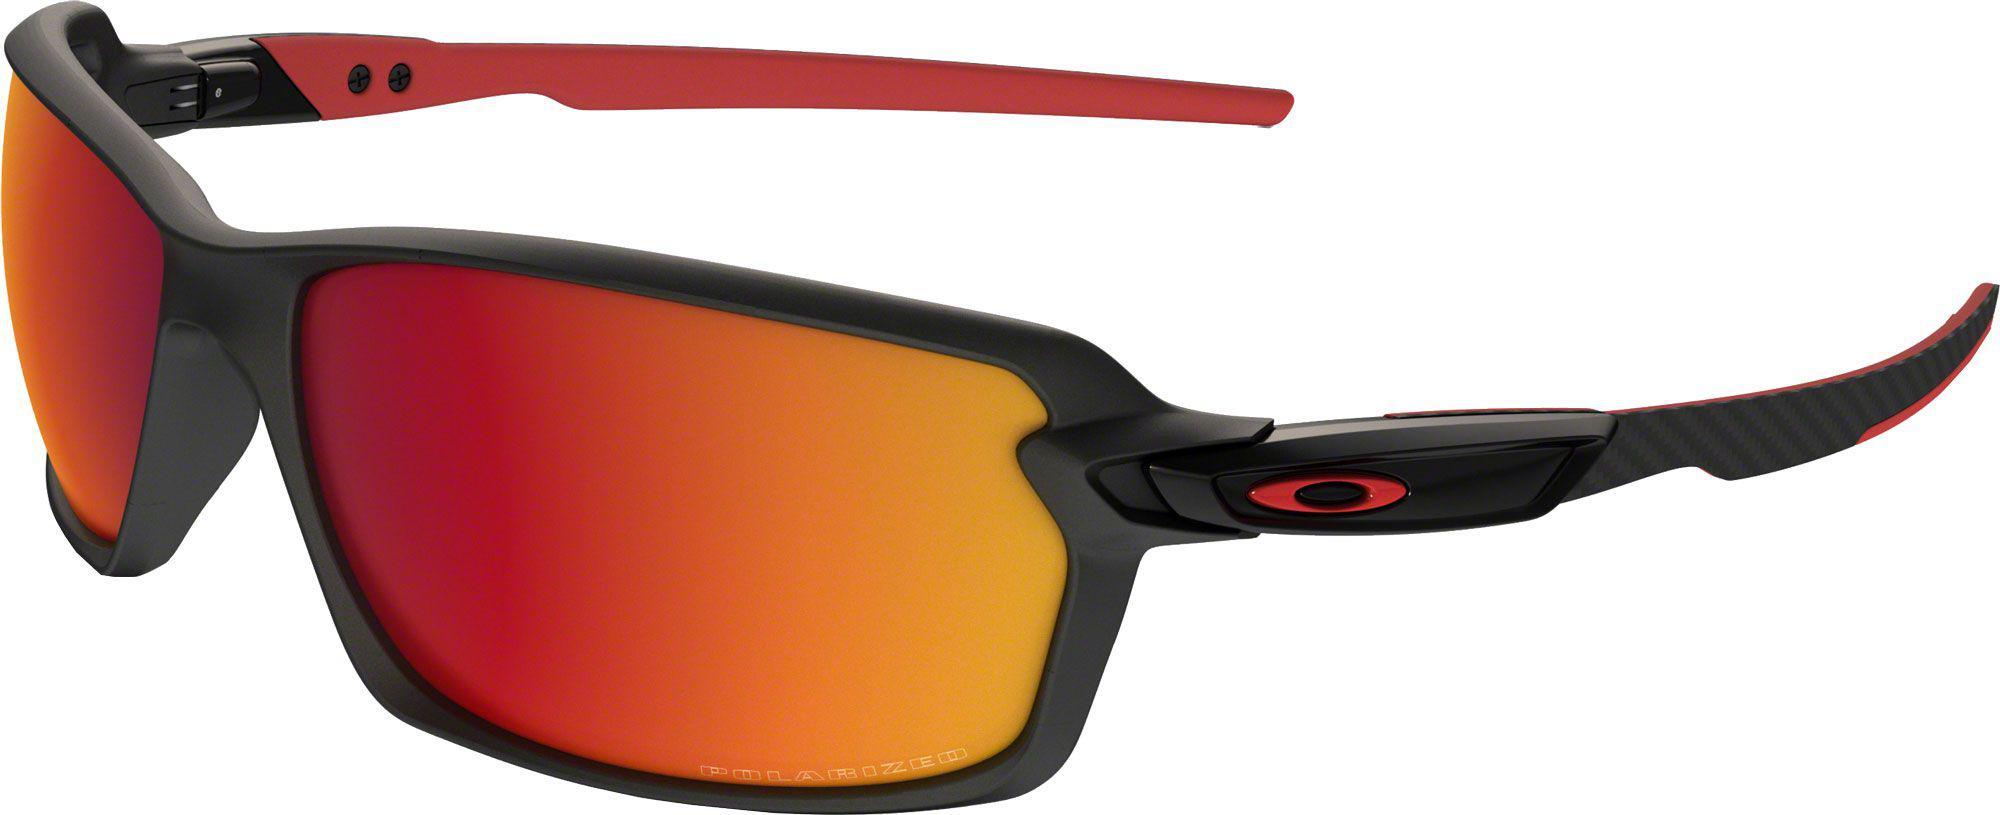 e3880819d21 Lyst - Oakley Carbon Shift Polarized Sunglasses in Black for Men